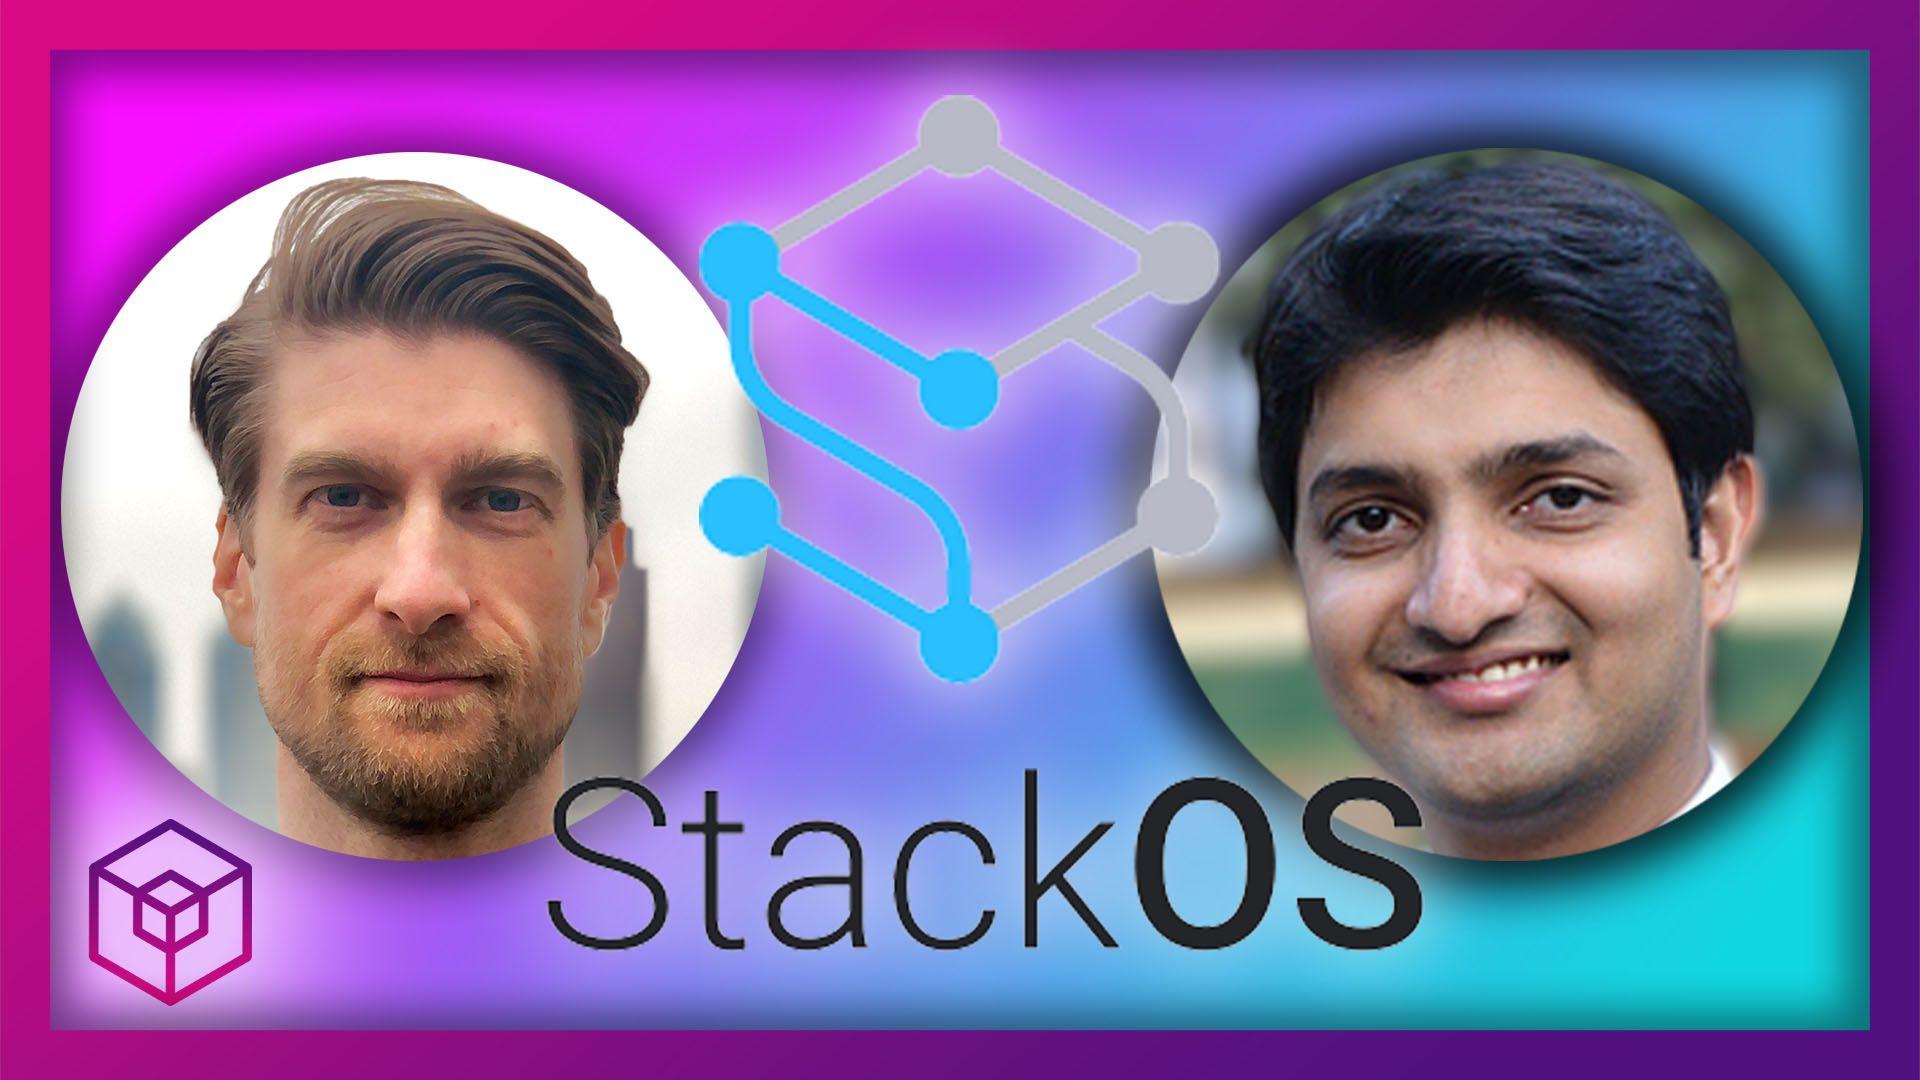 /stackos-decentralized-cloud-infrastructure-vjm33ya feature image